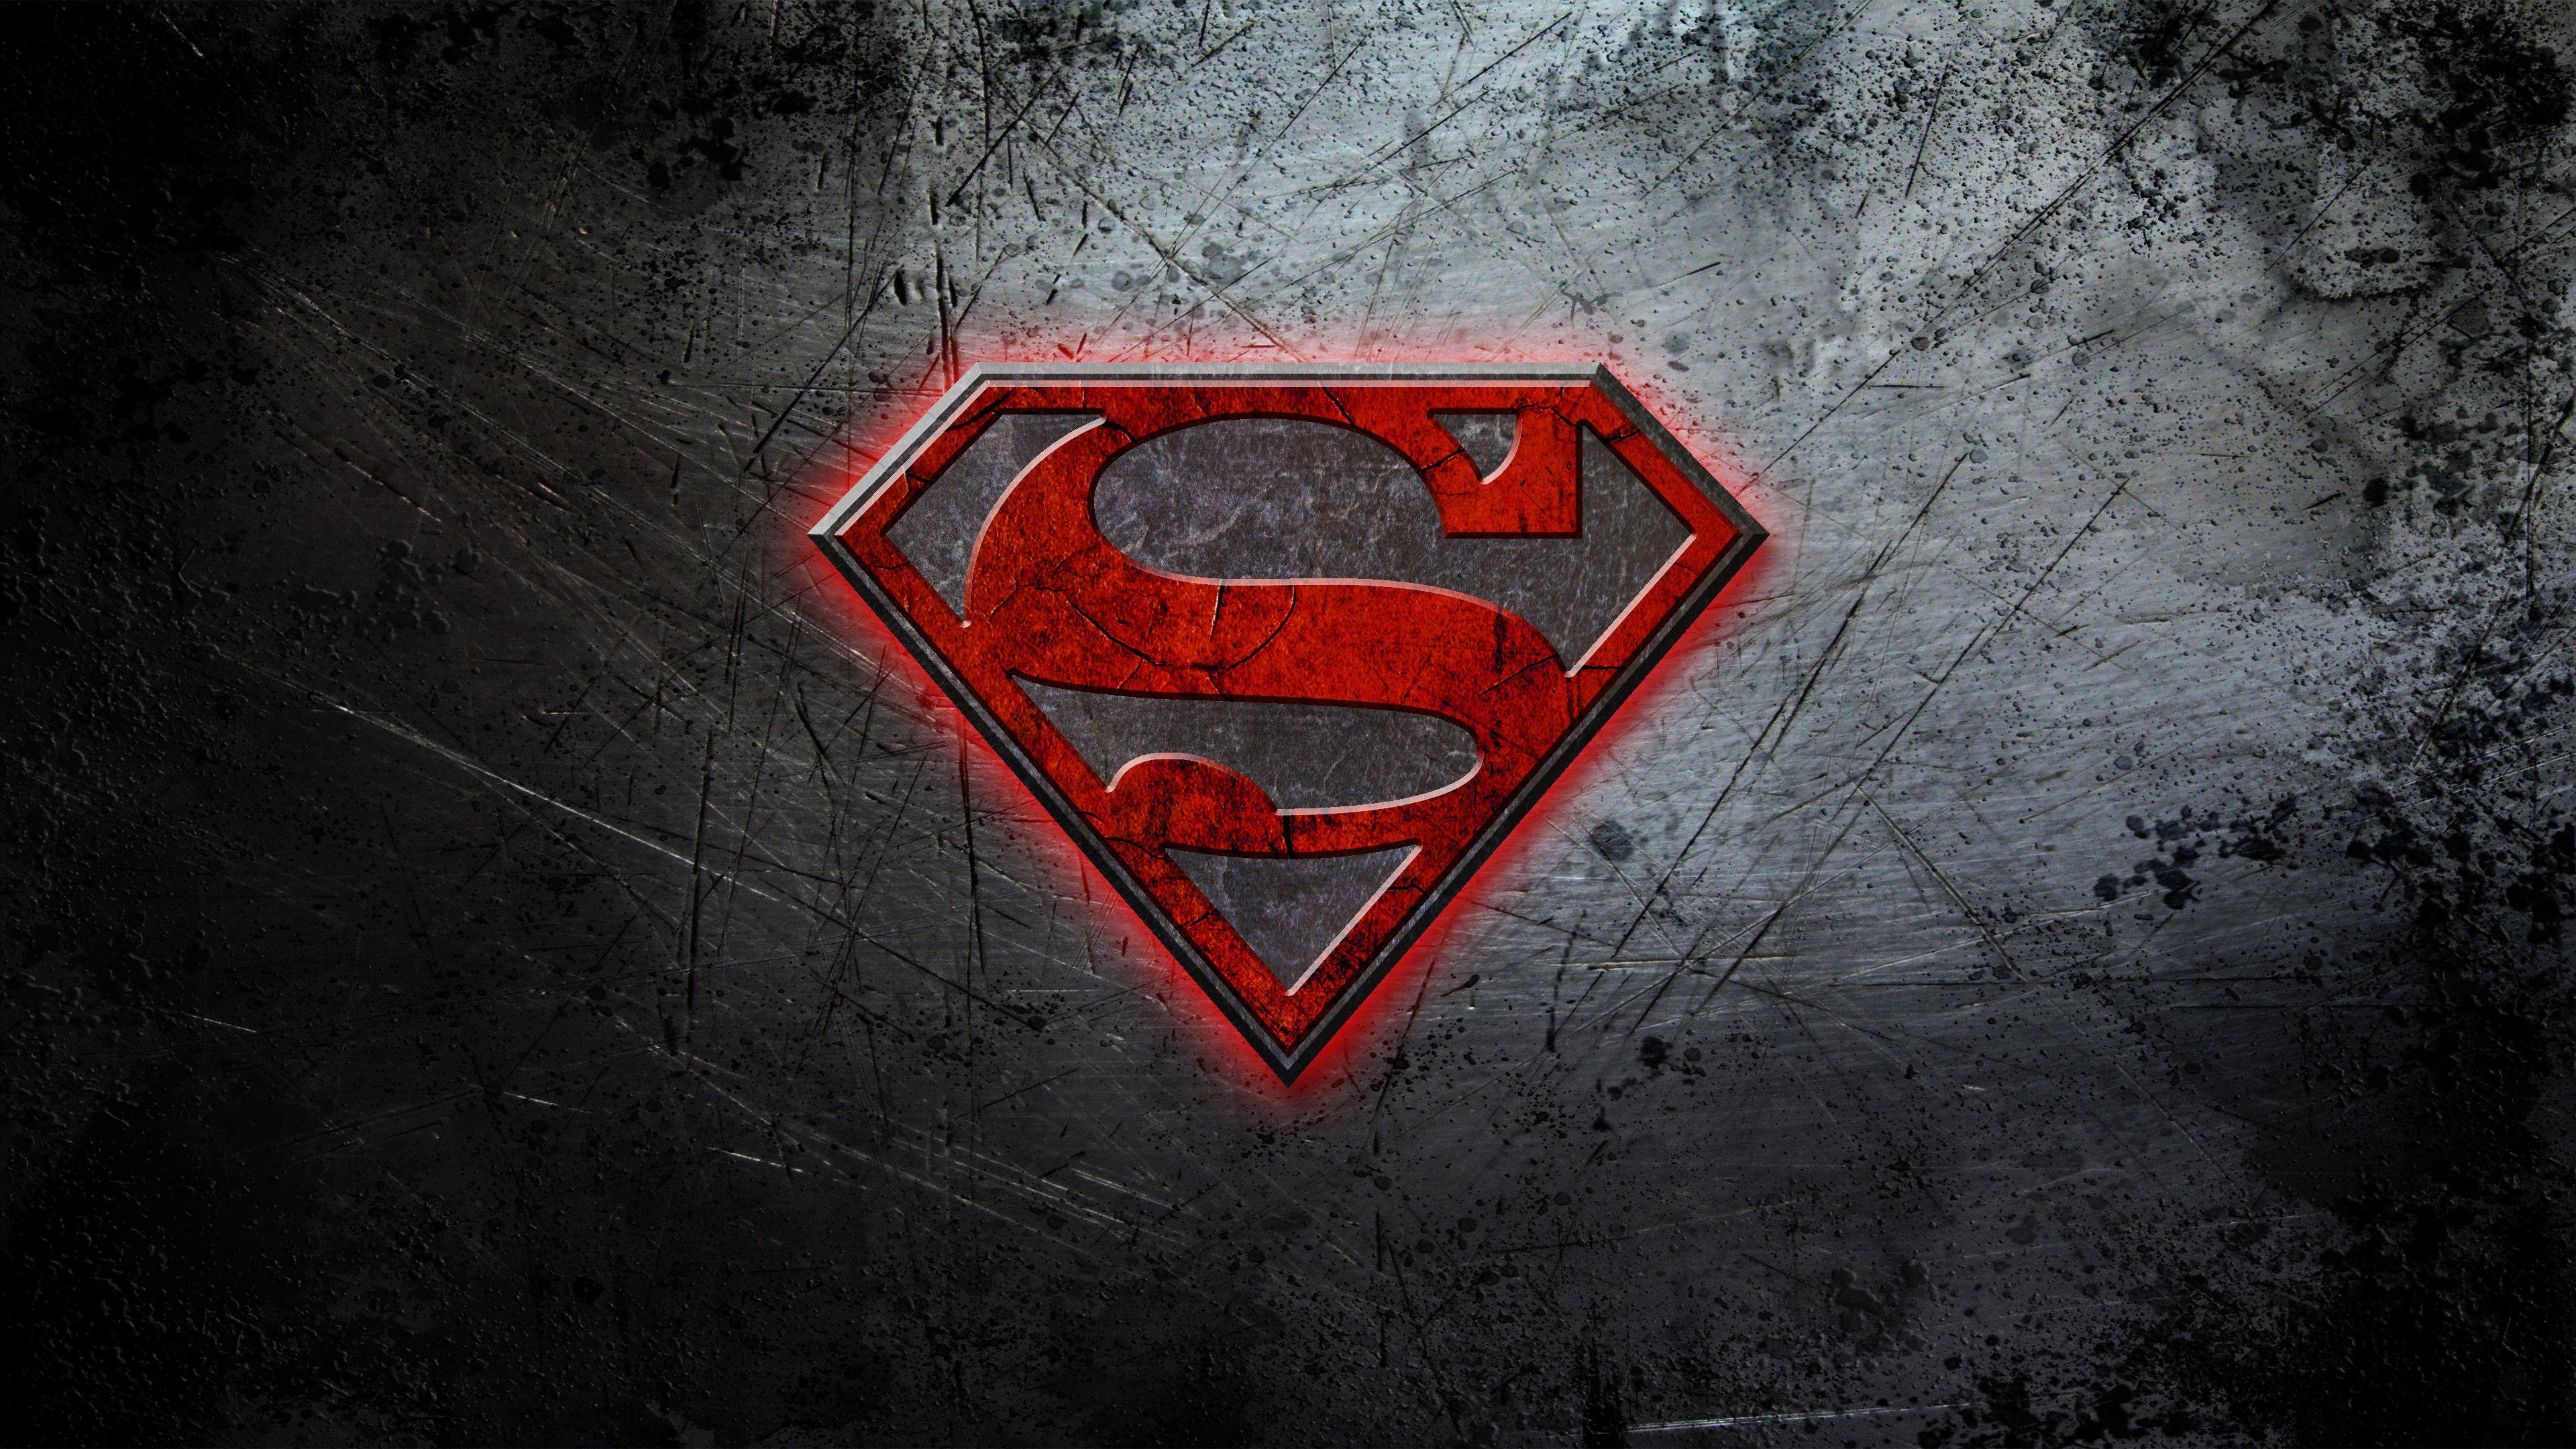 Fond D Ecran Hd Superman Fond Ecran Hd Fond Ecran Hd Pc Fond Ecran